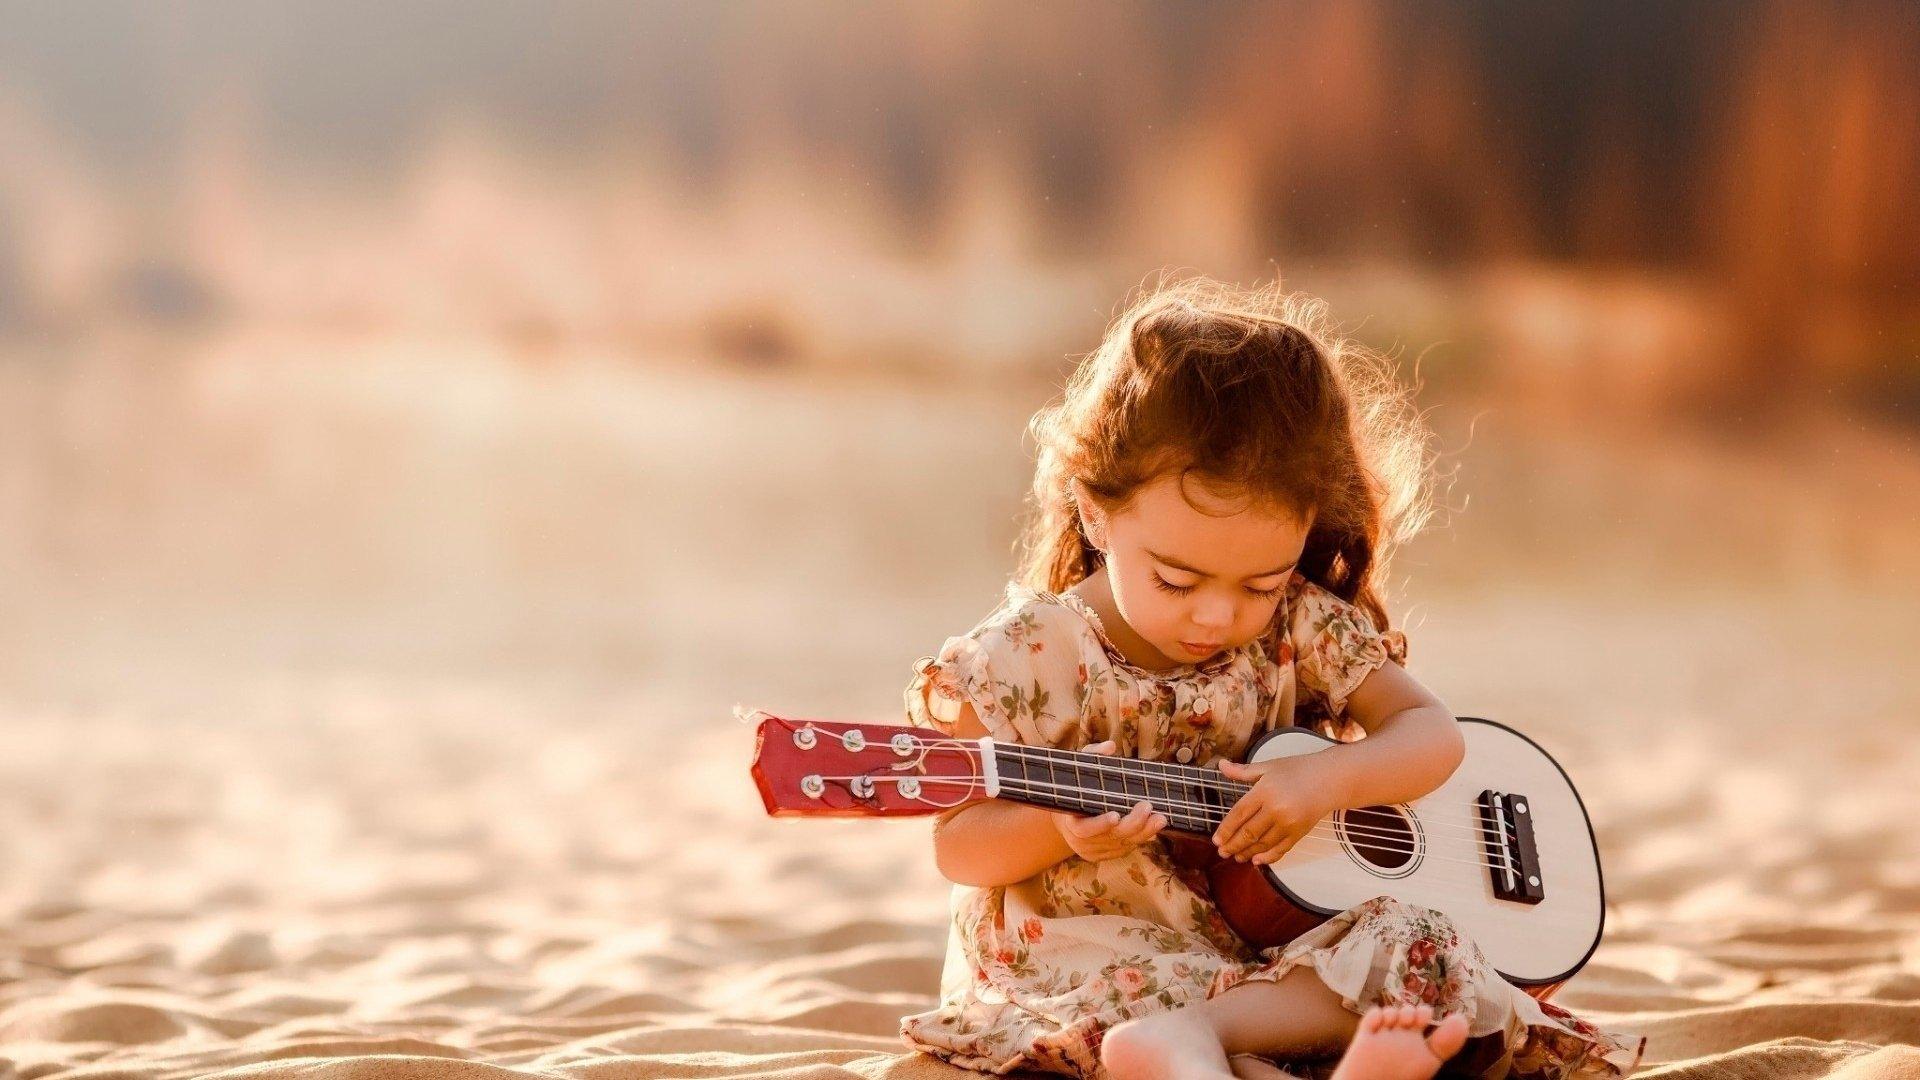 Child HD Wallpaper | Background Image | 1920x1080 | ID ...